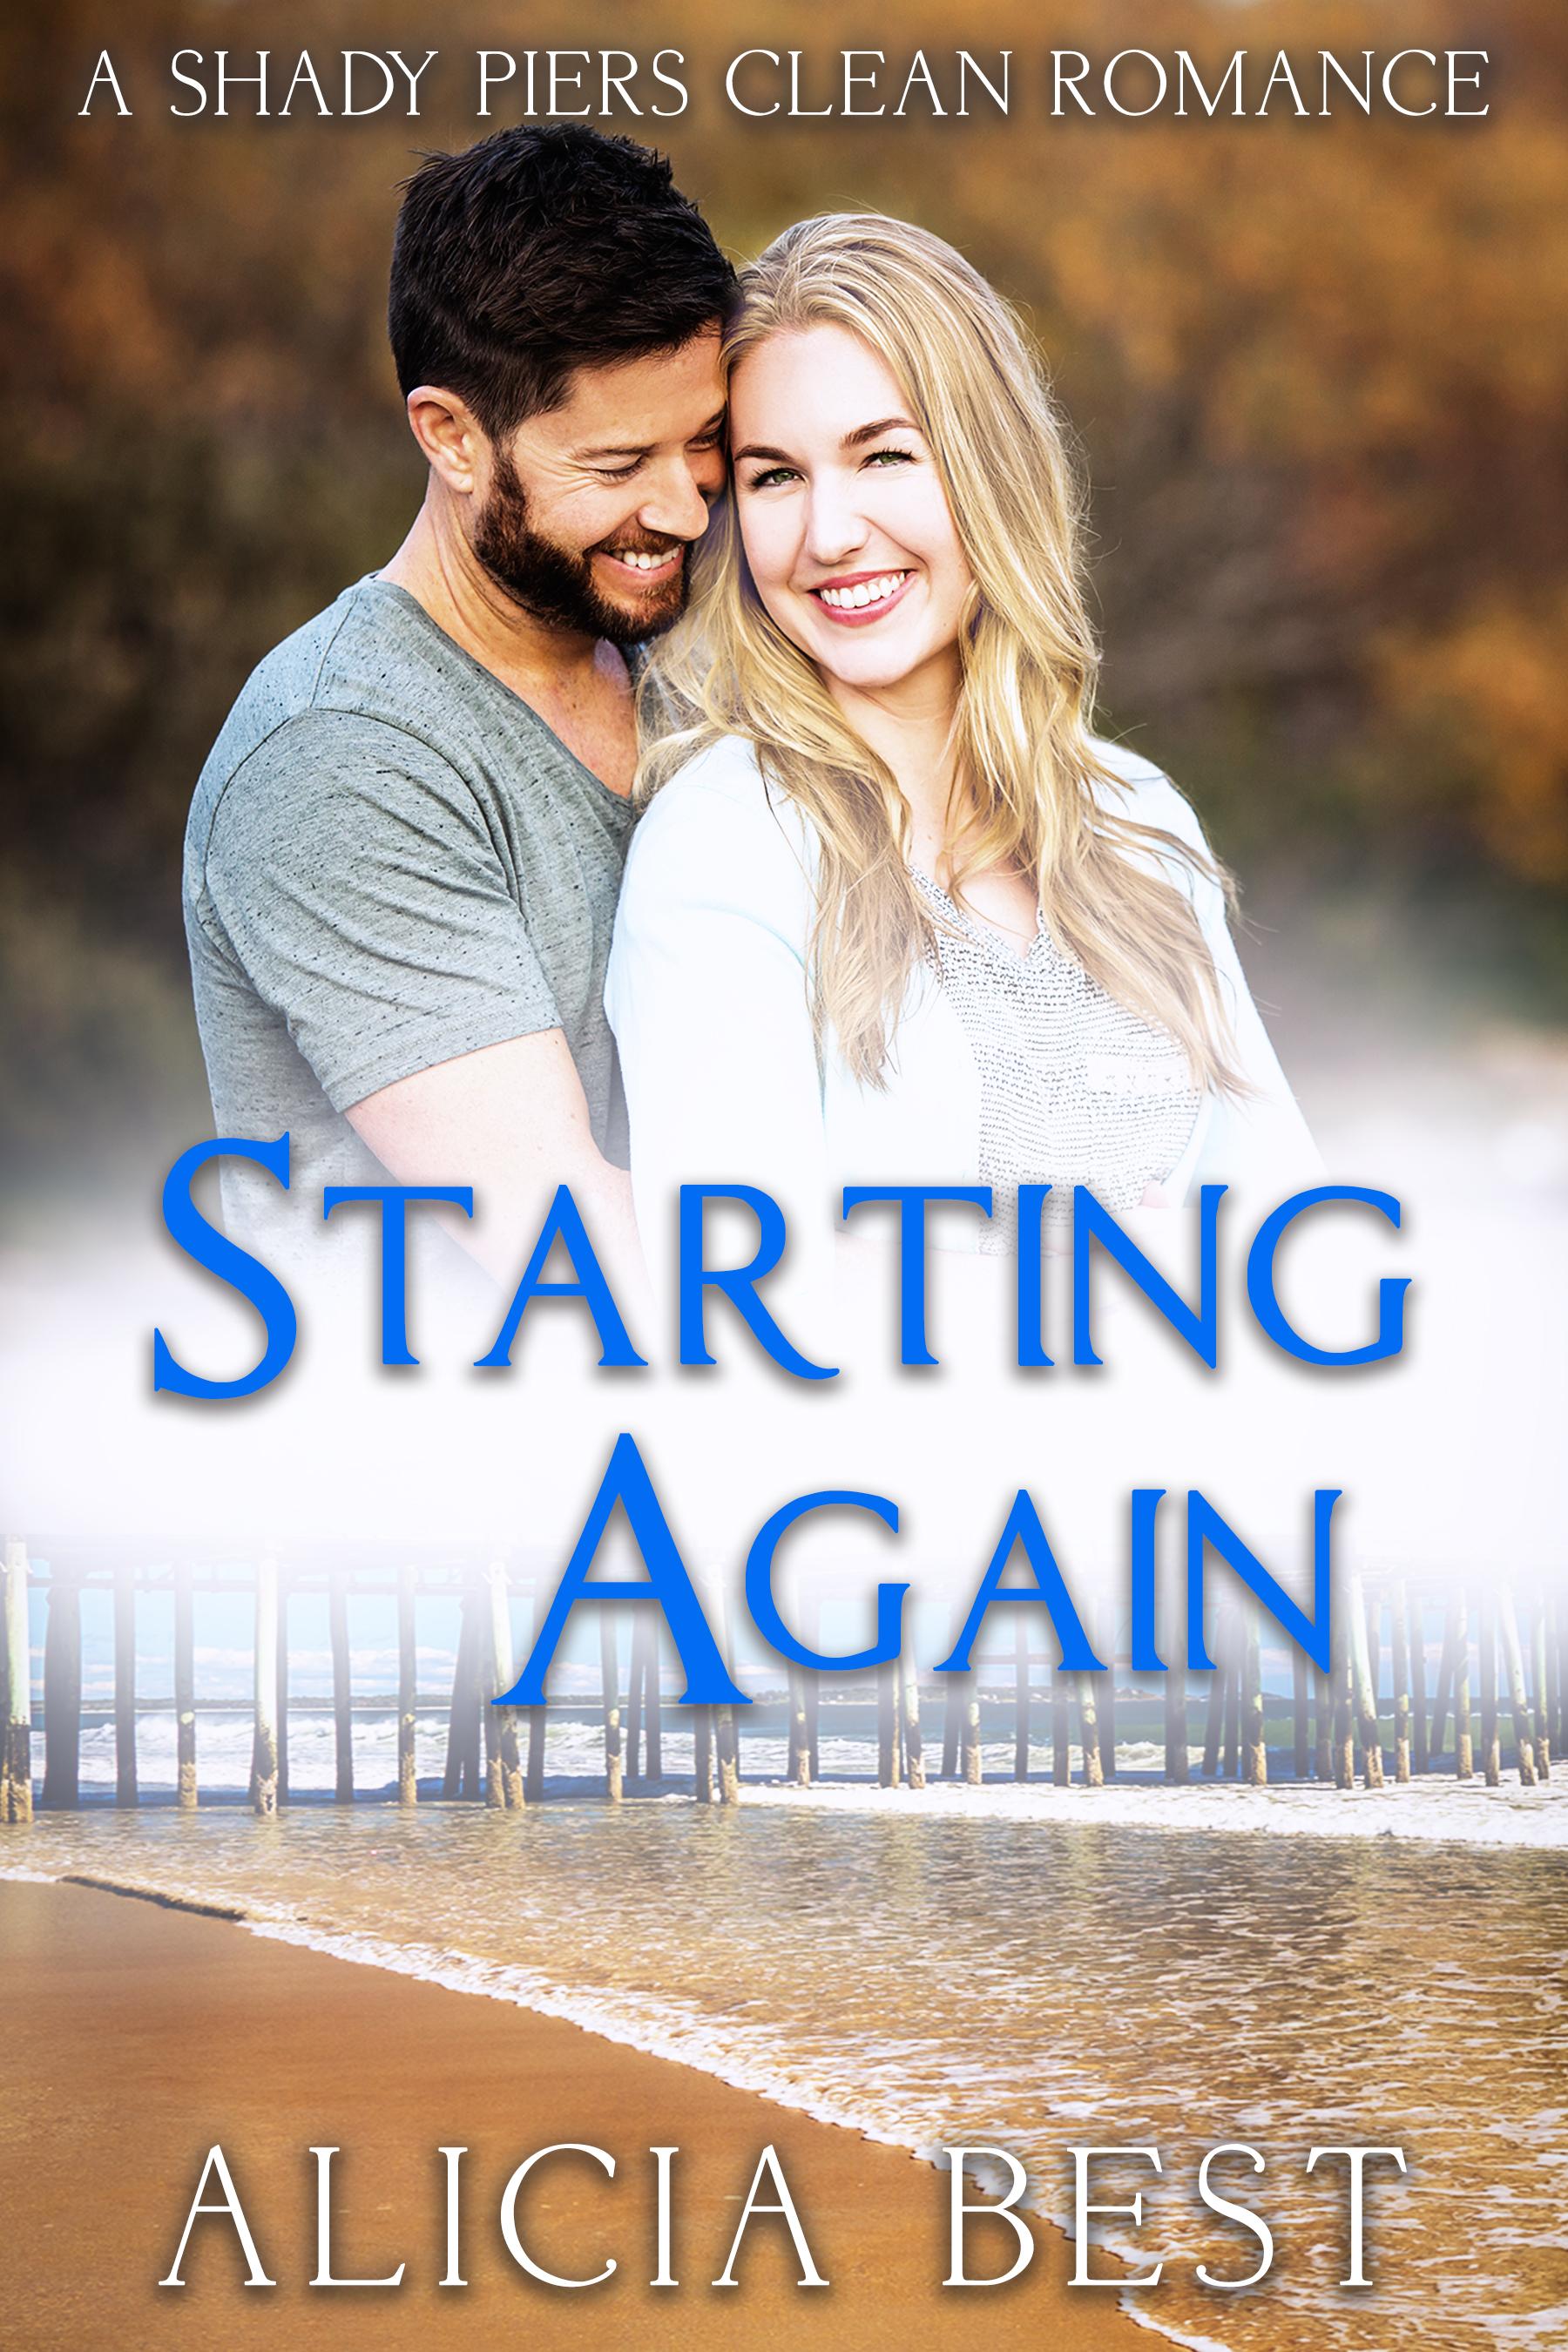 alicia best – romance author – Heartwarming romance stories